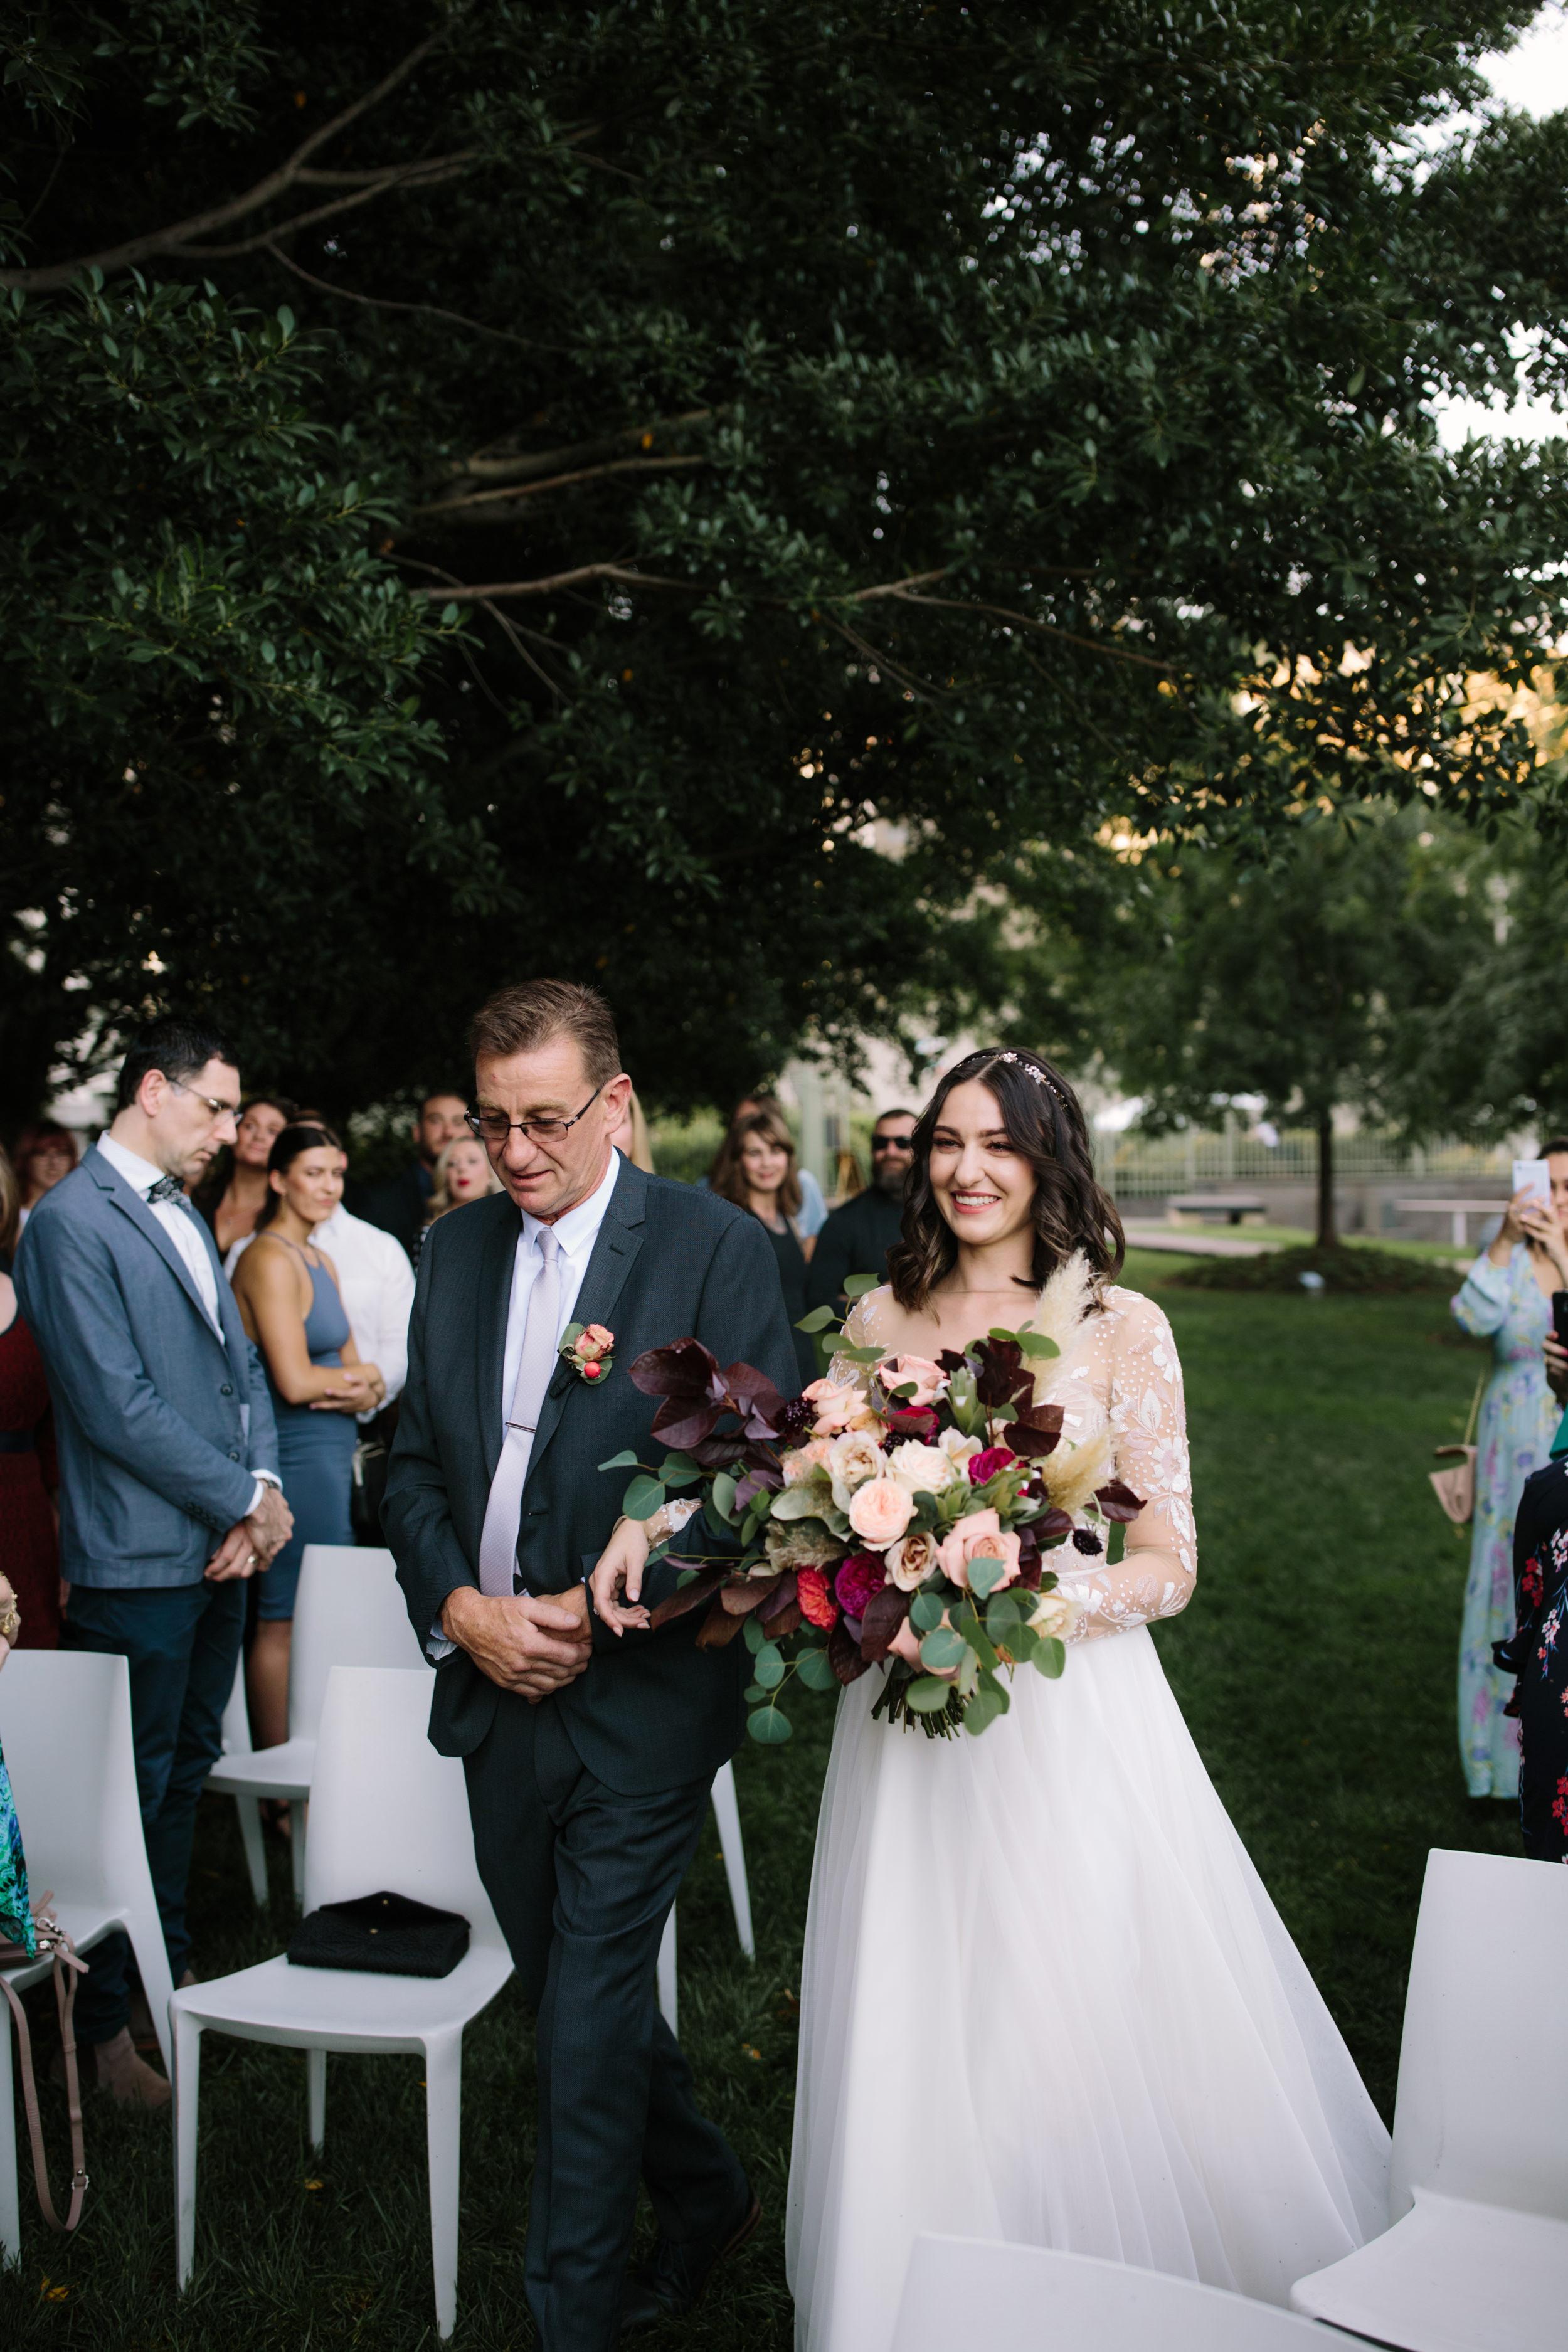 I-Got-You-Babe-Weddings-Hayley-Sam-NGV-Melbourne0054.JPG